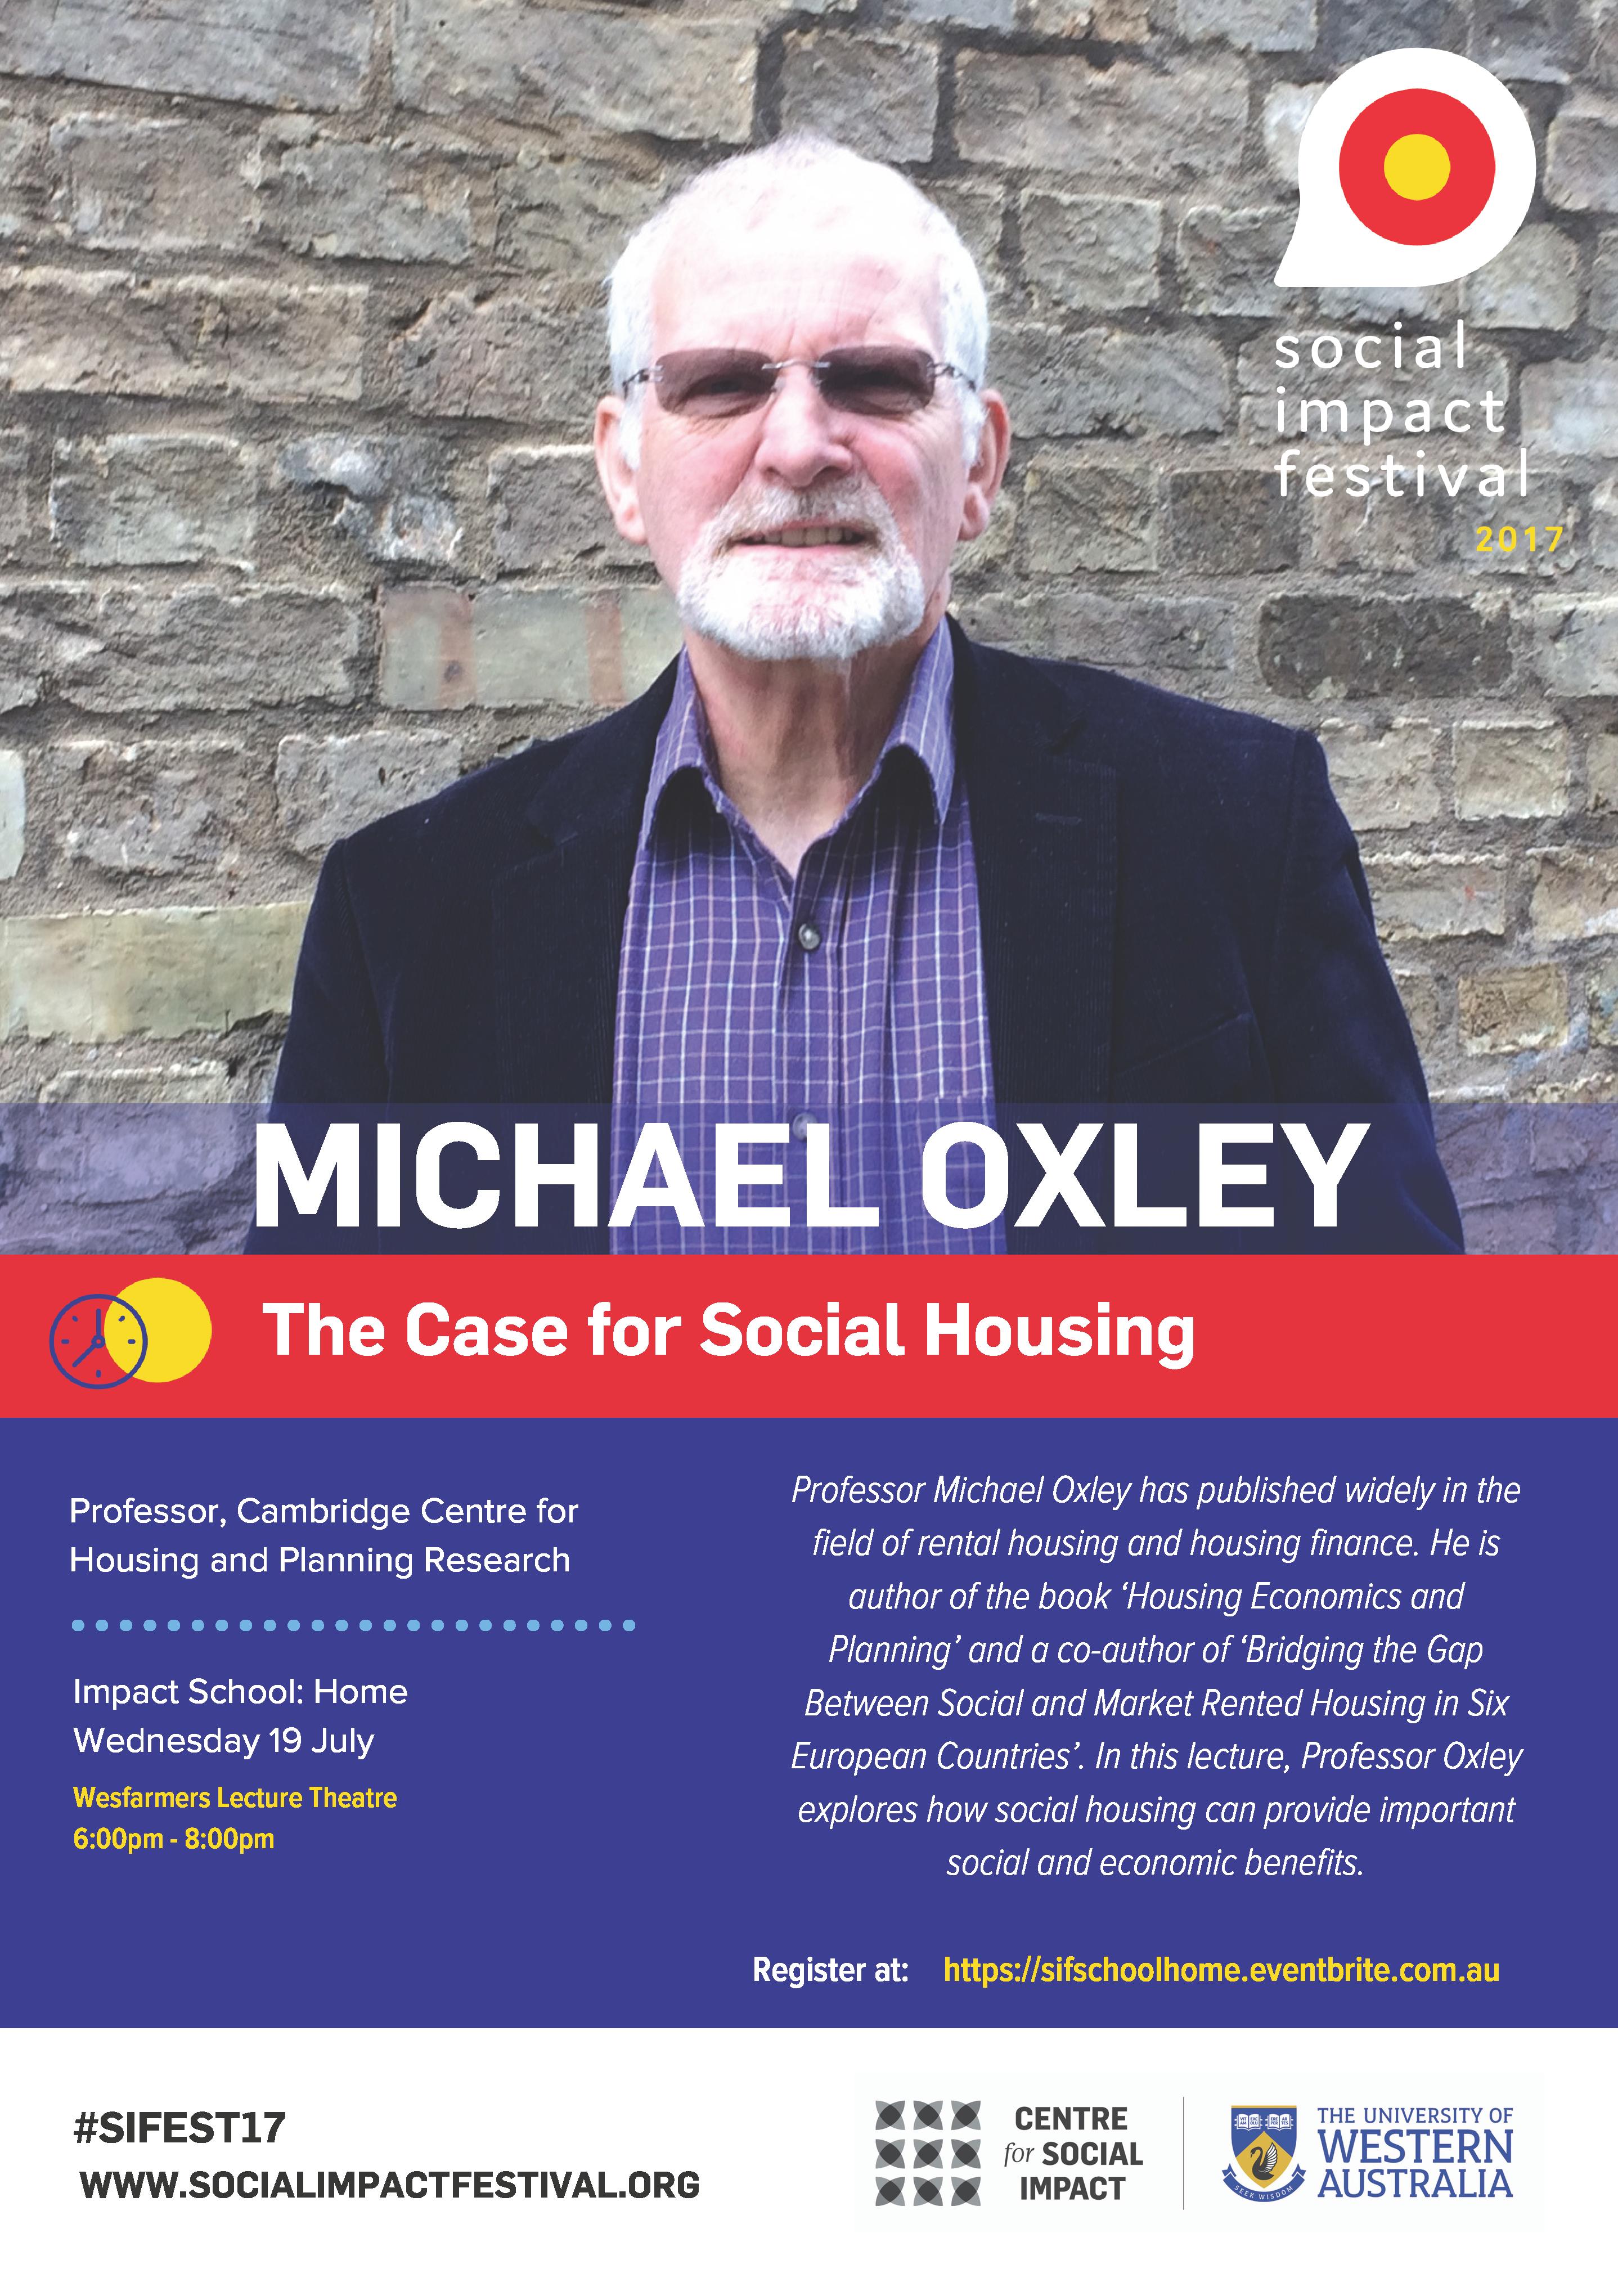 Professor Michael Oxley: keynote speaker at the 2017 Social Impact Festival